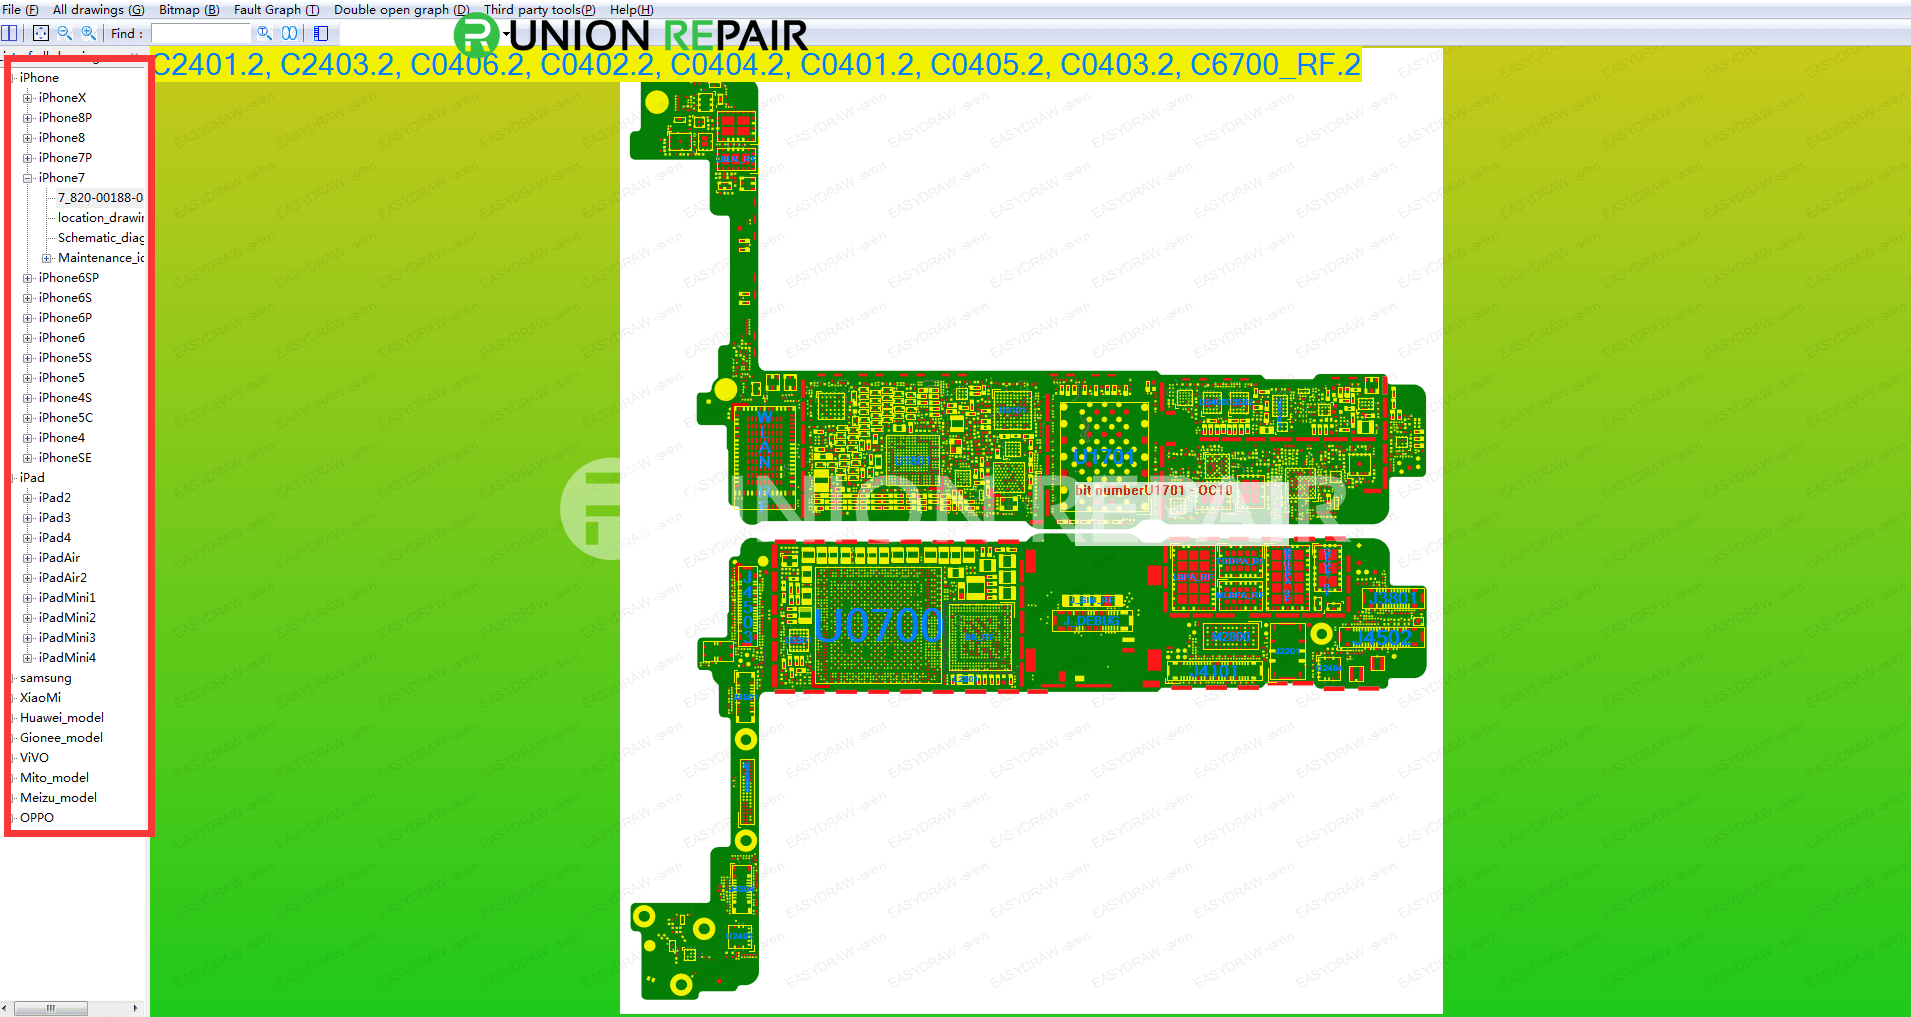 02f2ac2 iphone 5s schematic circuit diagrams wiring resources ipod 5 diagram iphone 5s schematic circuit diagrams #12